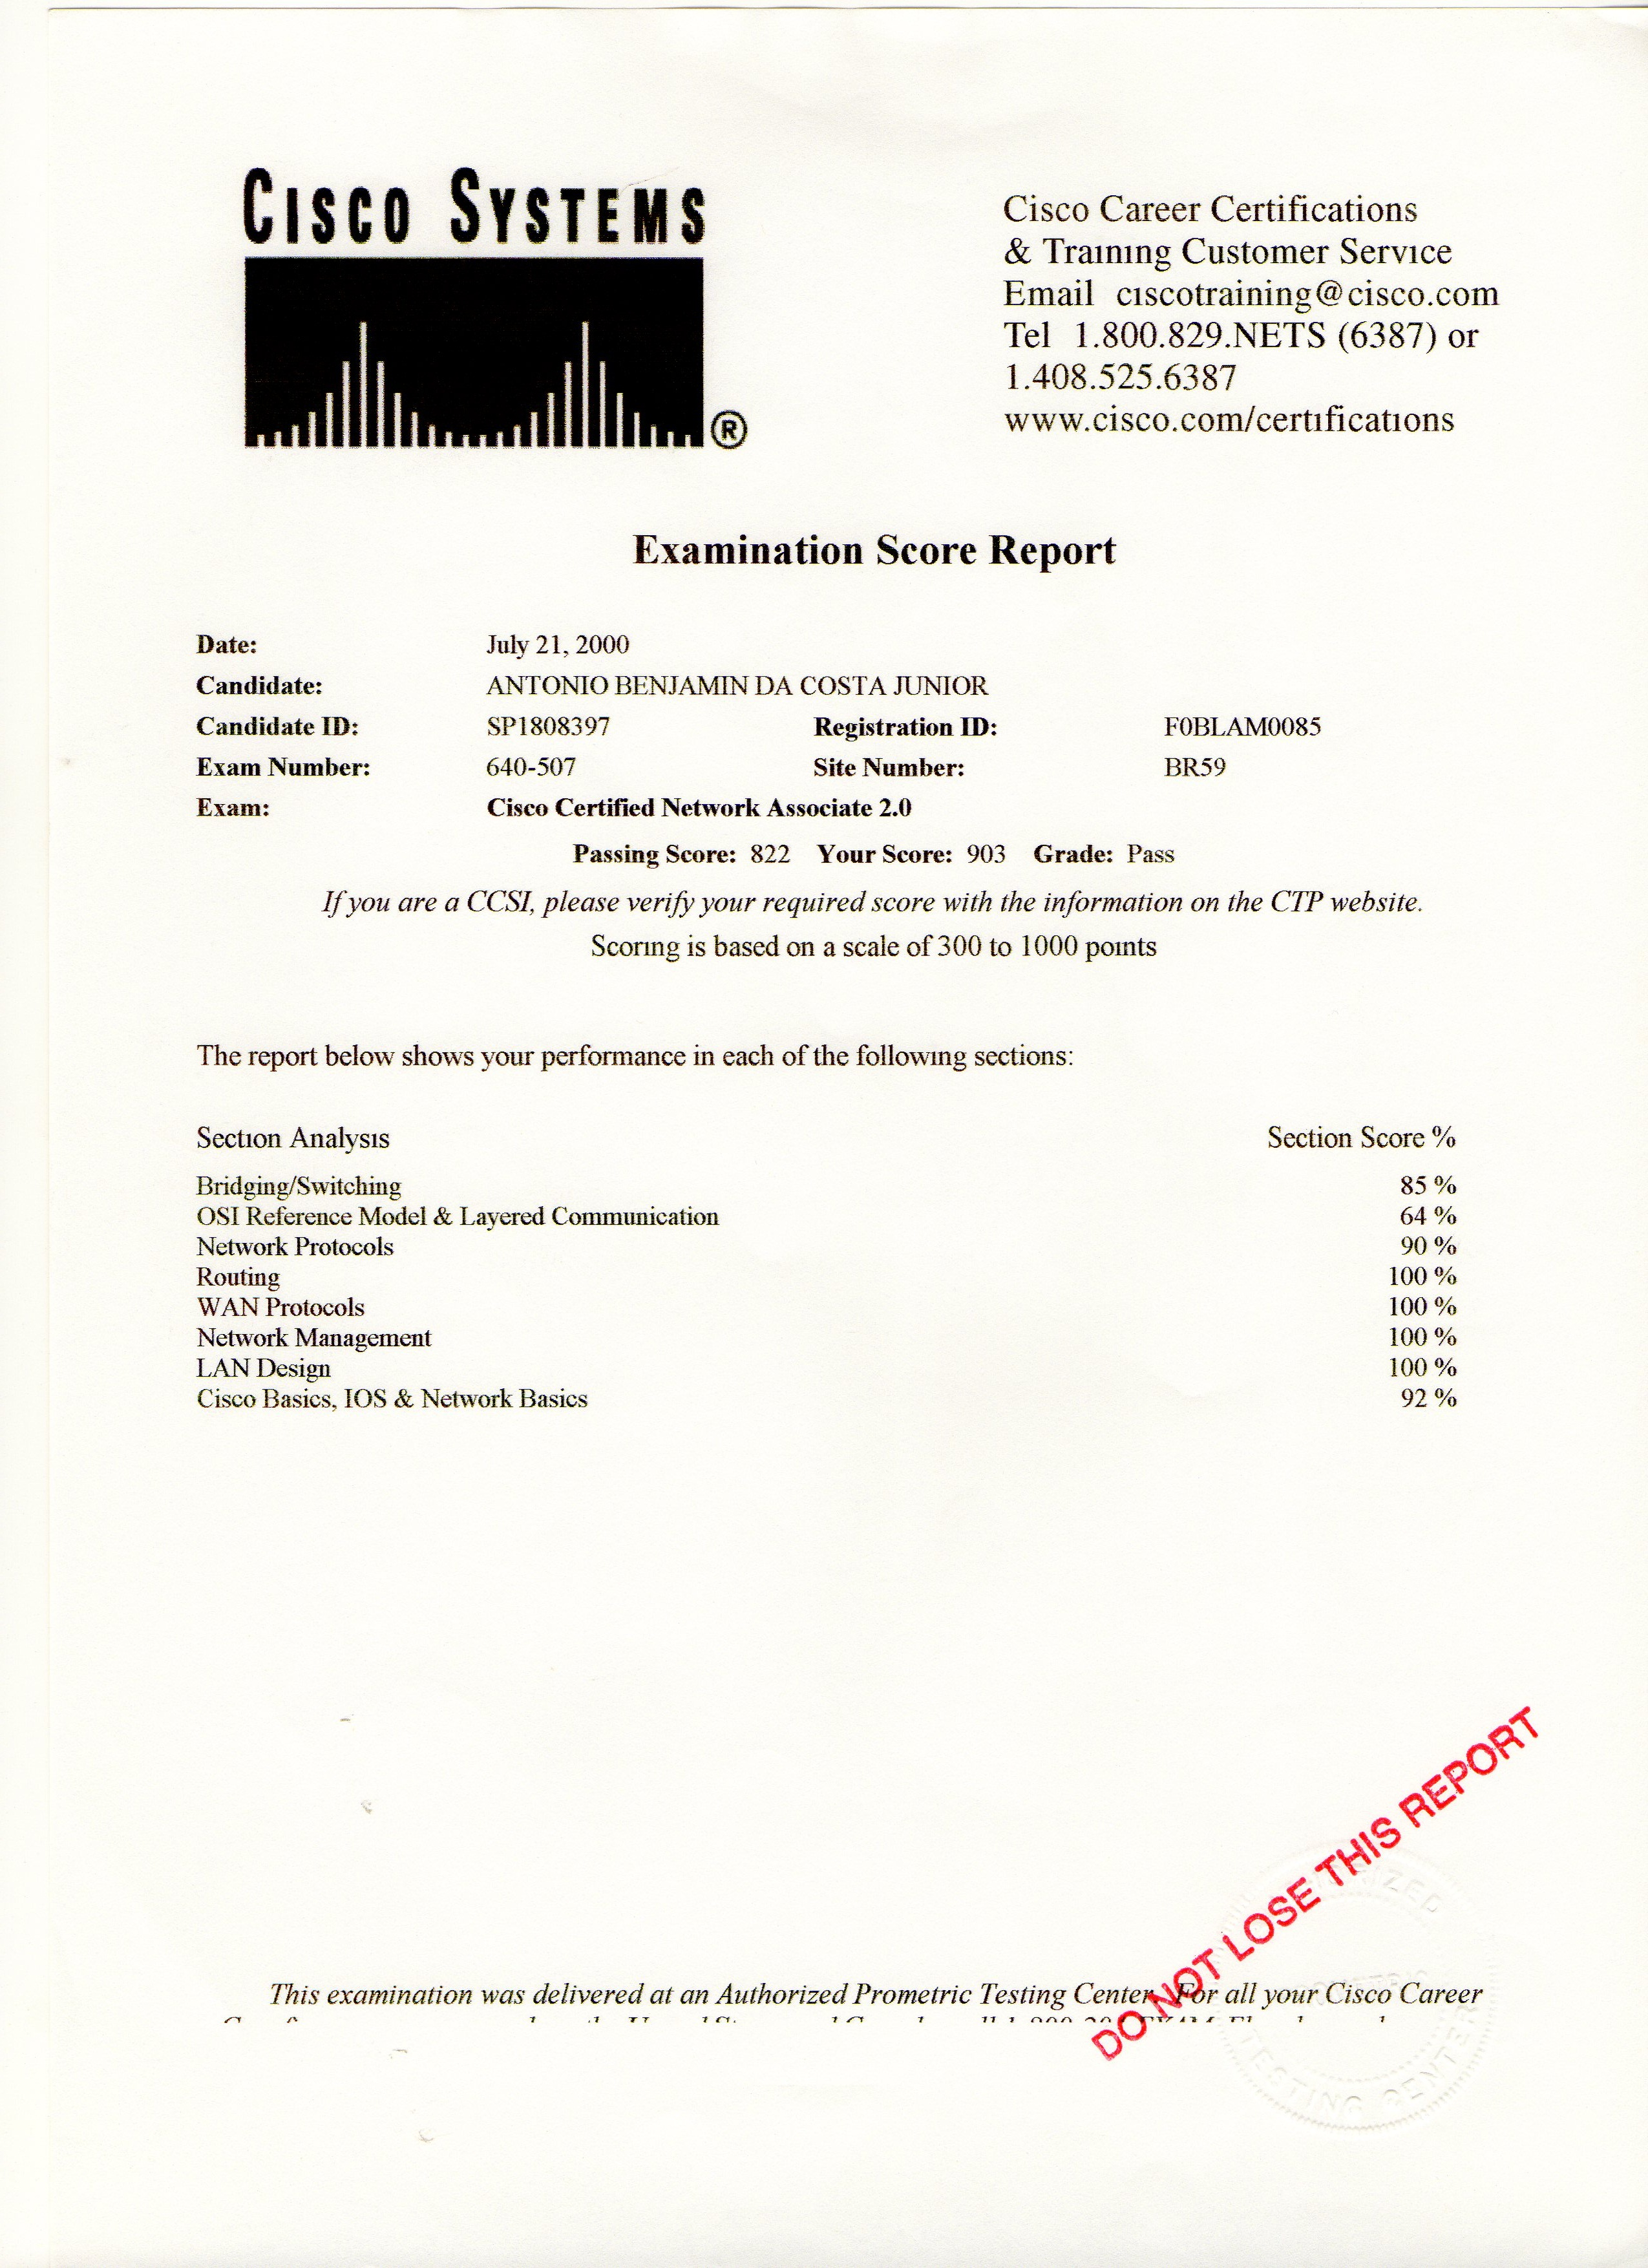 Antonio costa the unforgiven official site cisco certified network associate jpg pdf xflitez Gallery